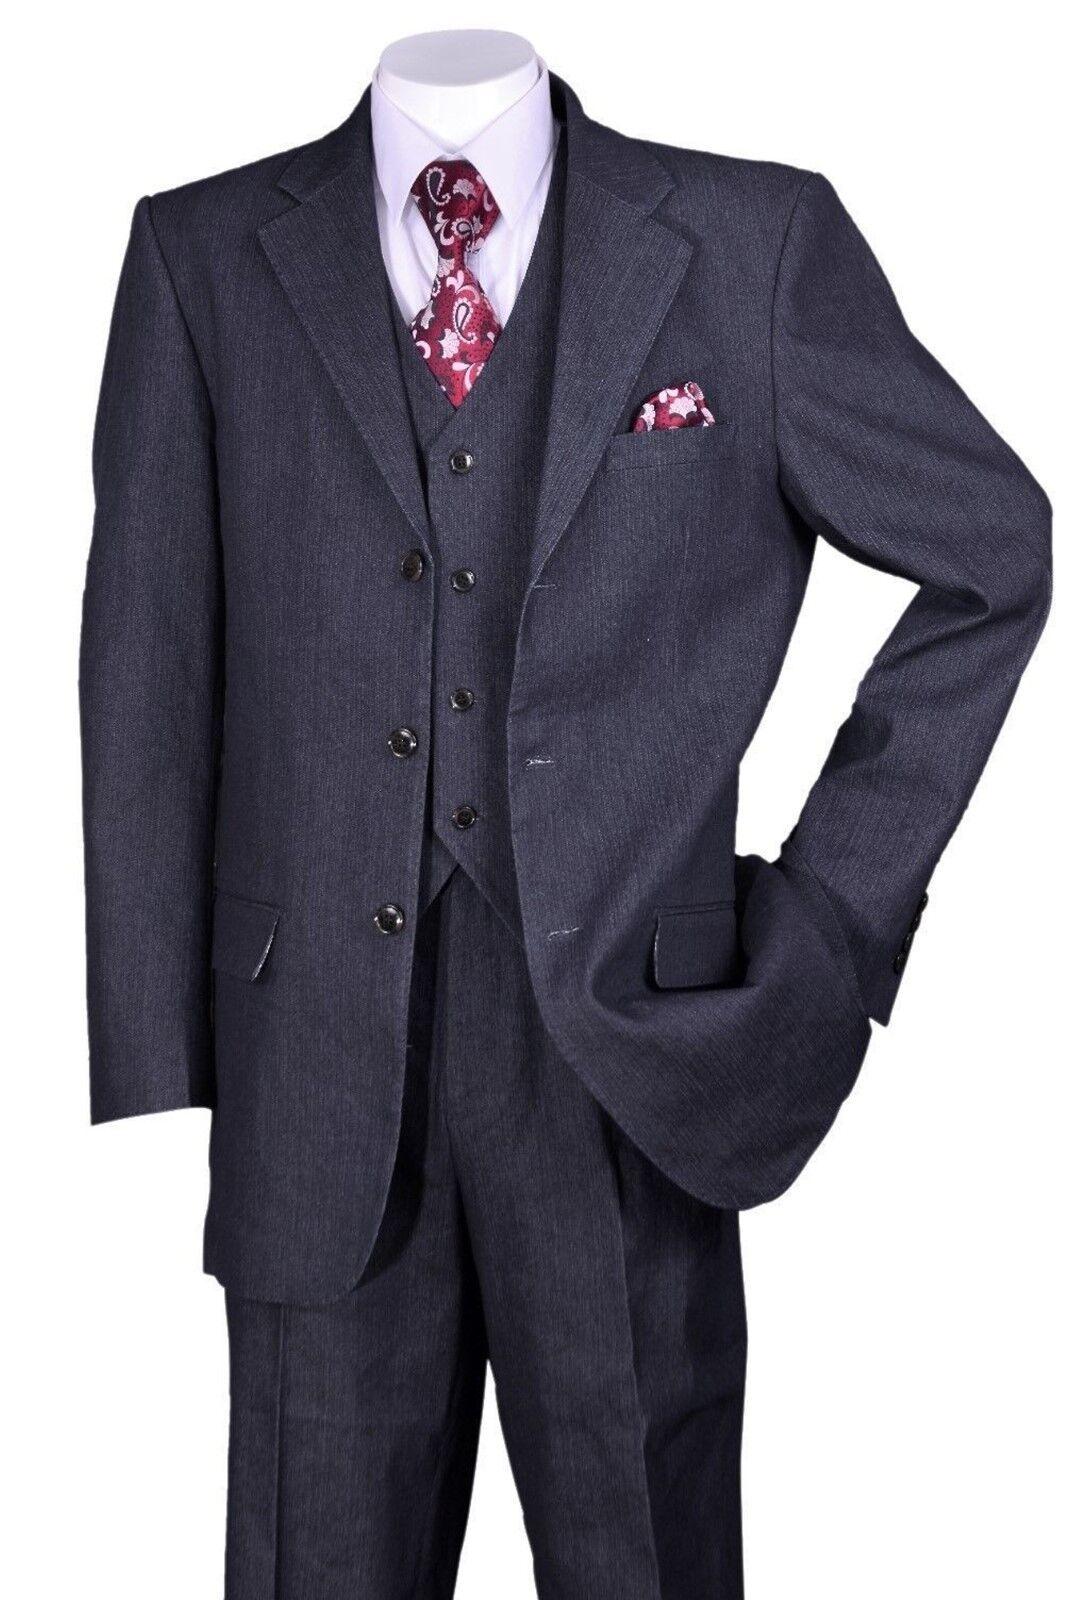 Fortino Landi Men/'s Trendy Denim 3 Buttons Suit w// Pants Vest Black//Navy 5287V